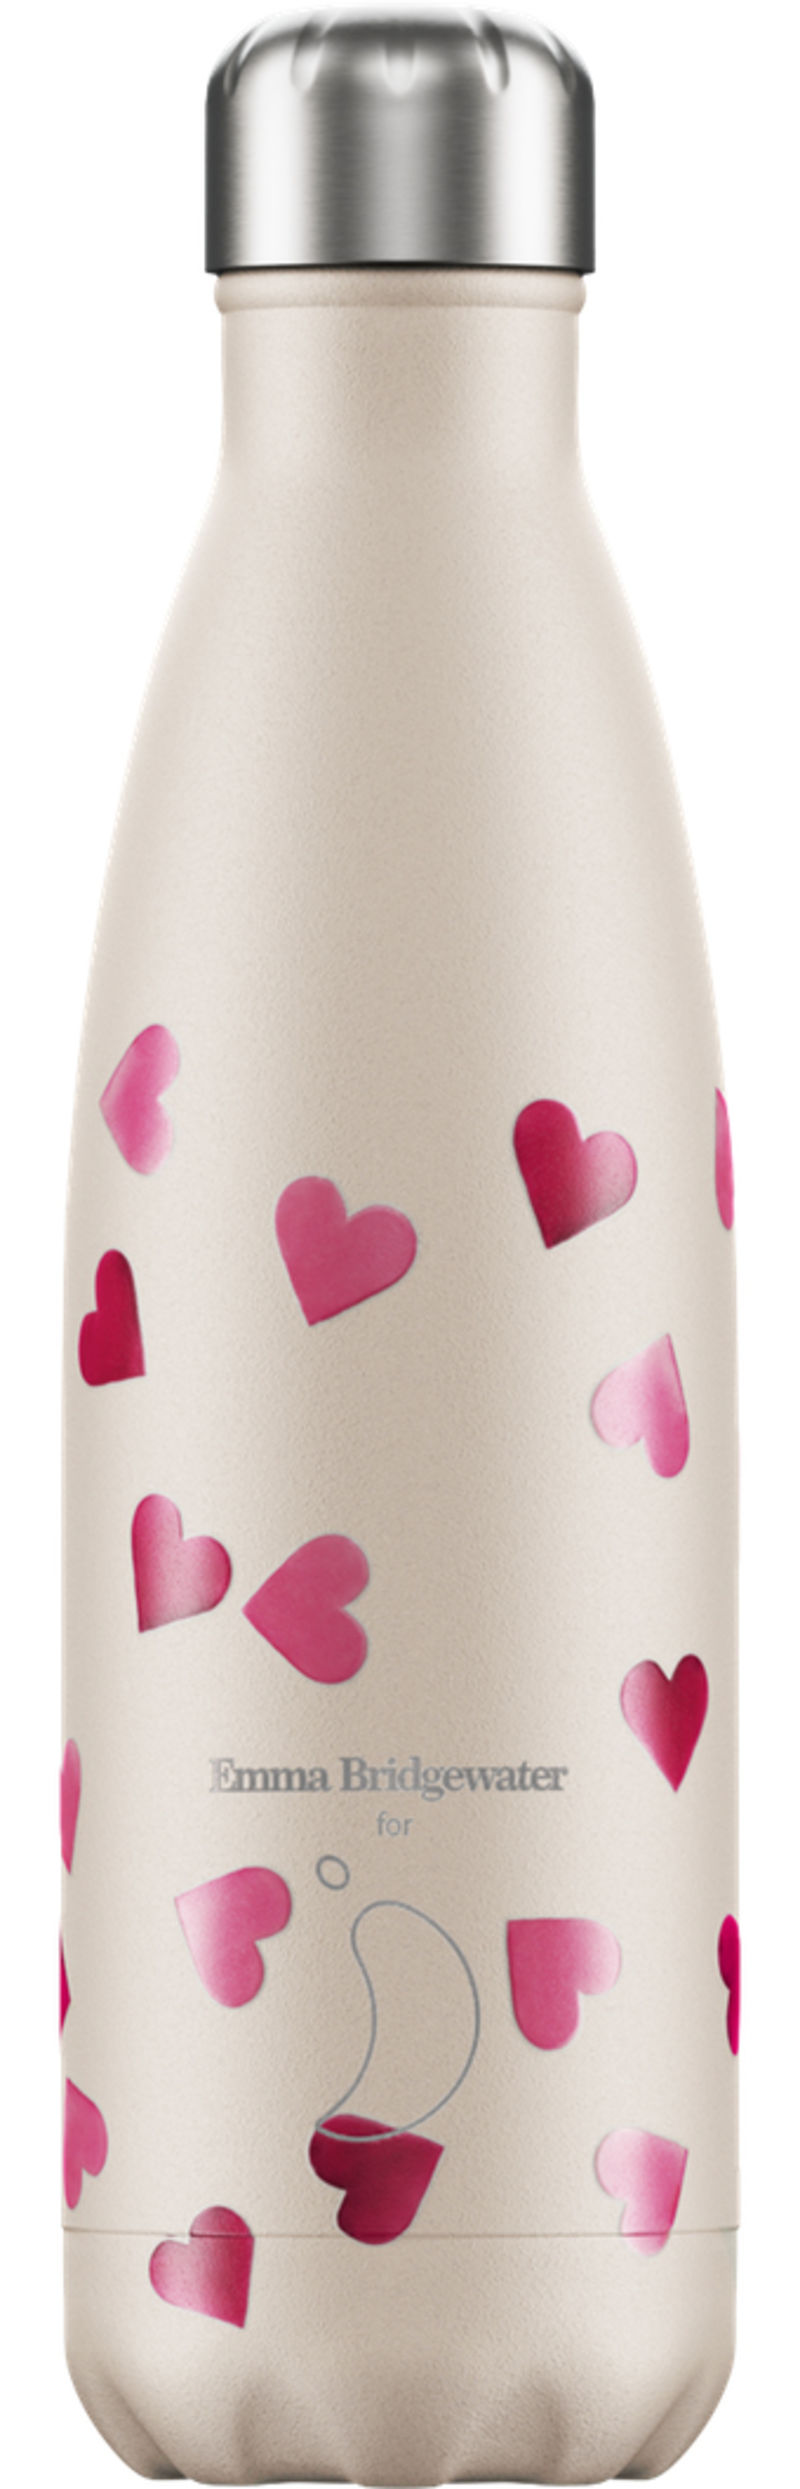 Botella Inox Corazones Emma Bridgeater 500ml -